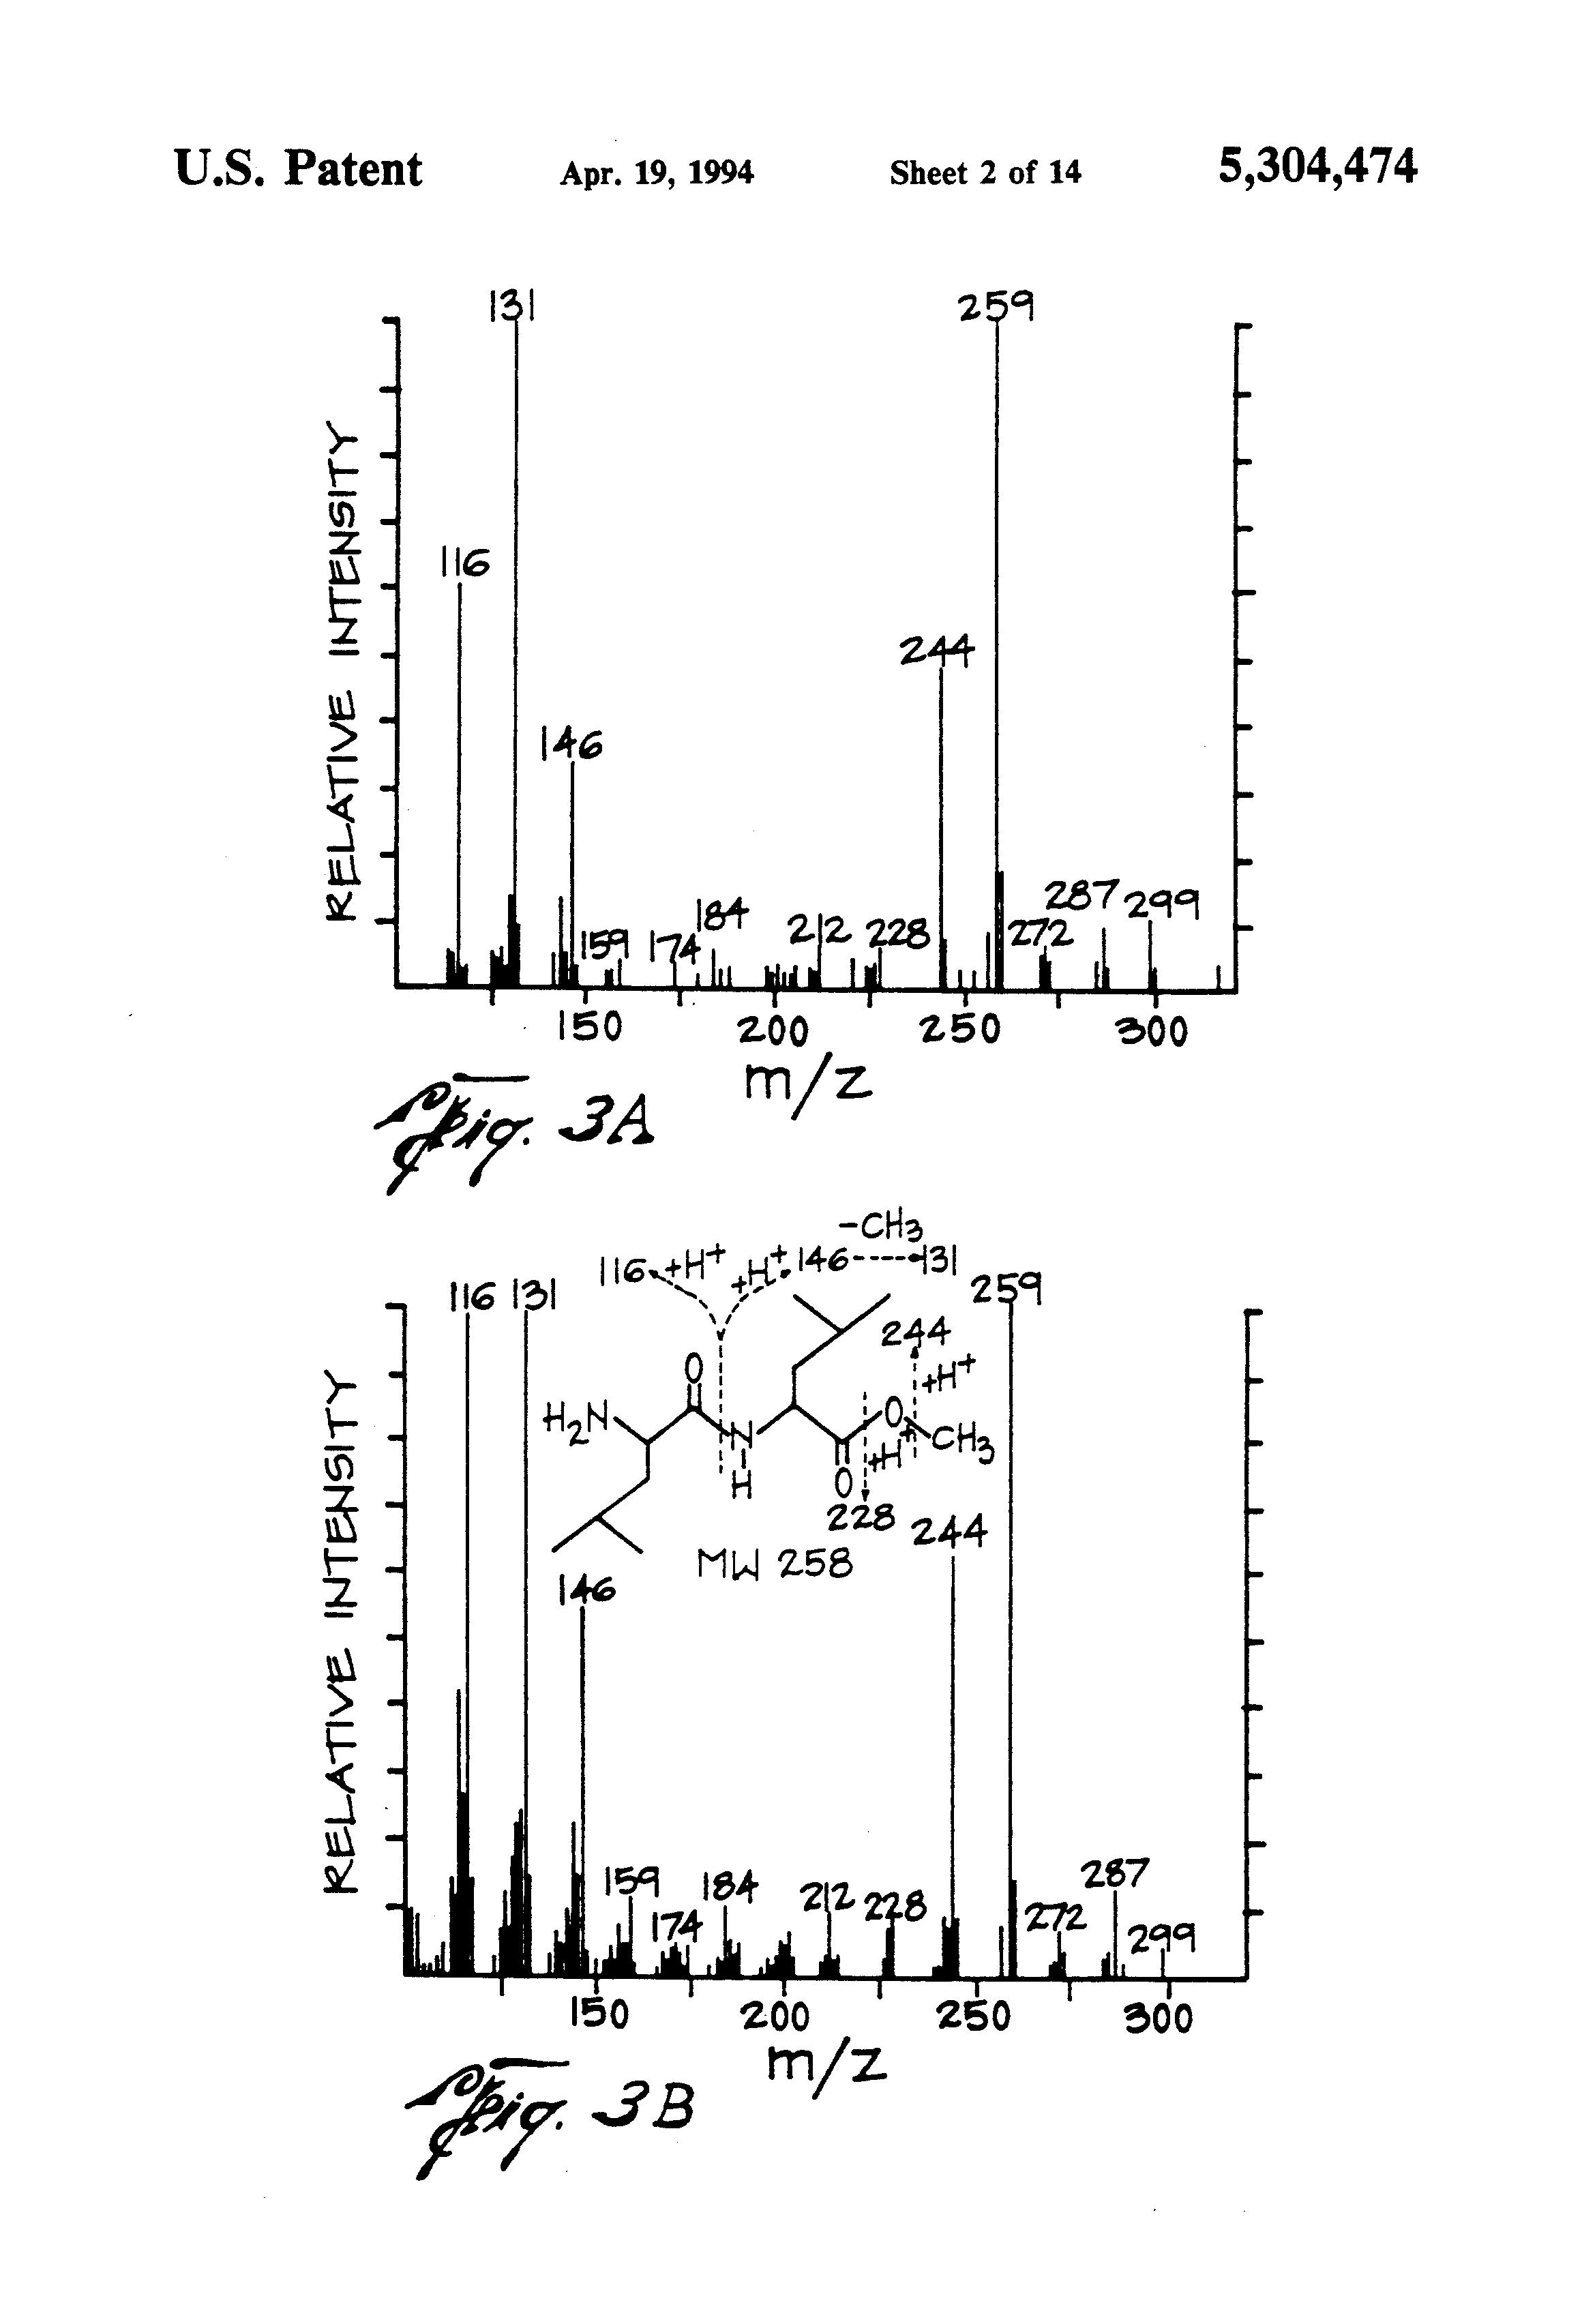 L-Phenylalanine-N-acetyl--methyl-ester